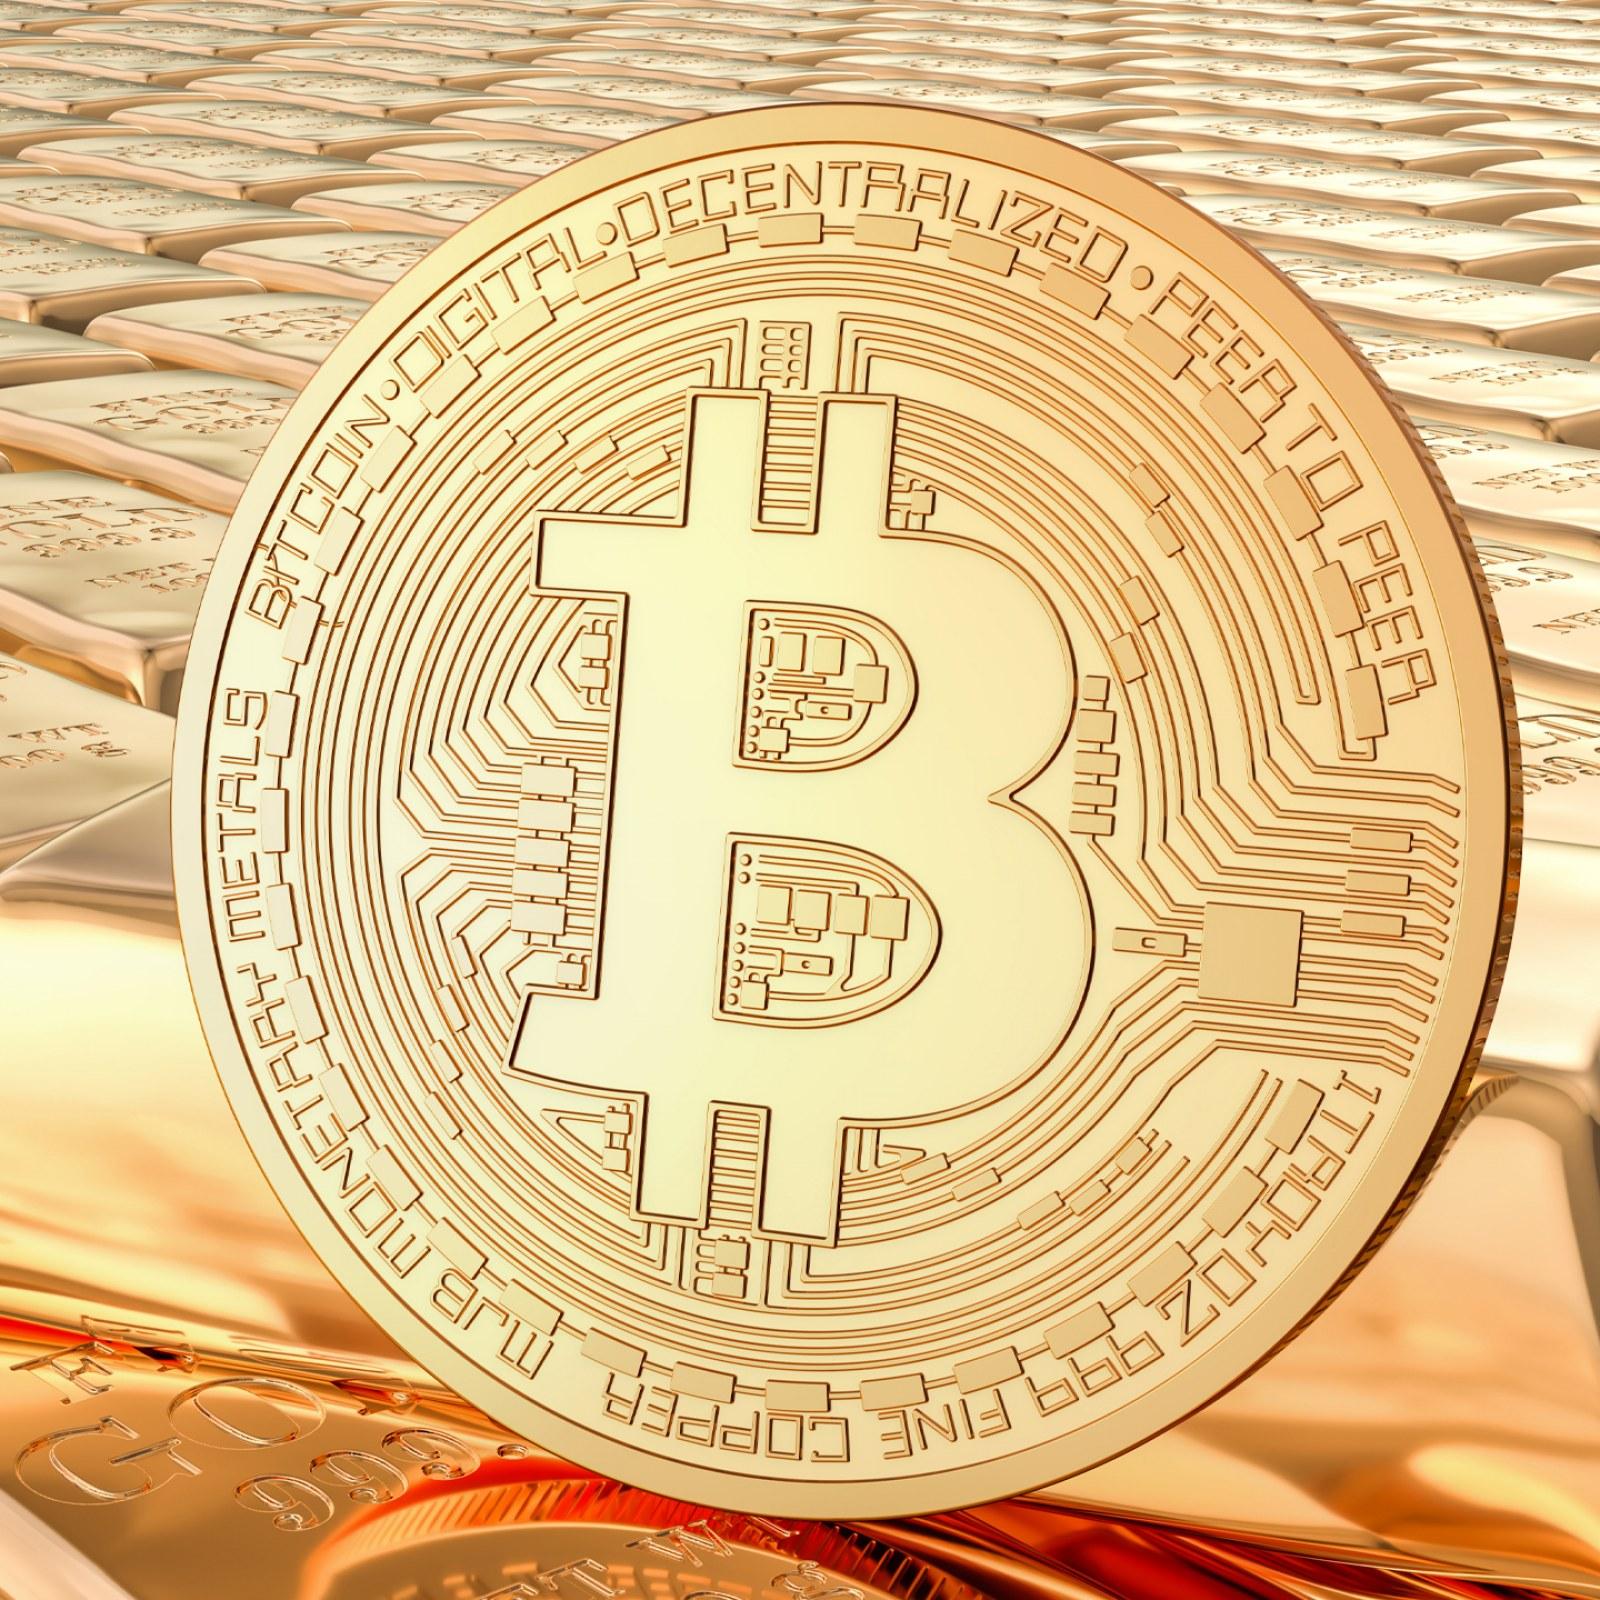 bakkt paleidžia bitcoin